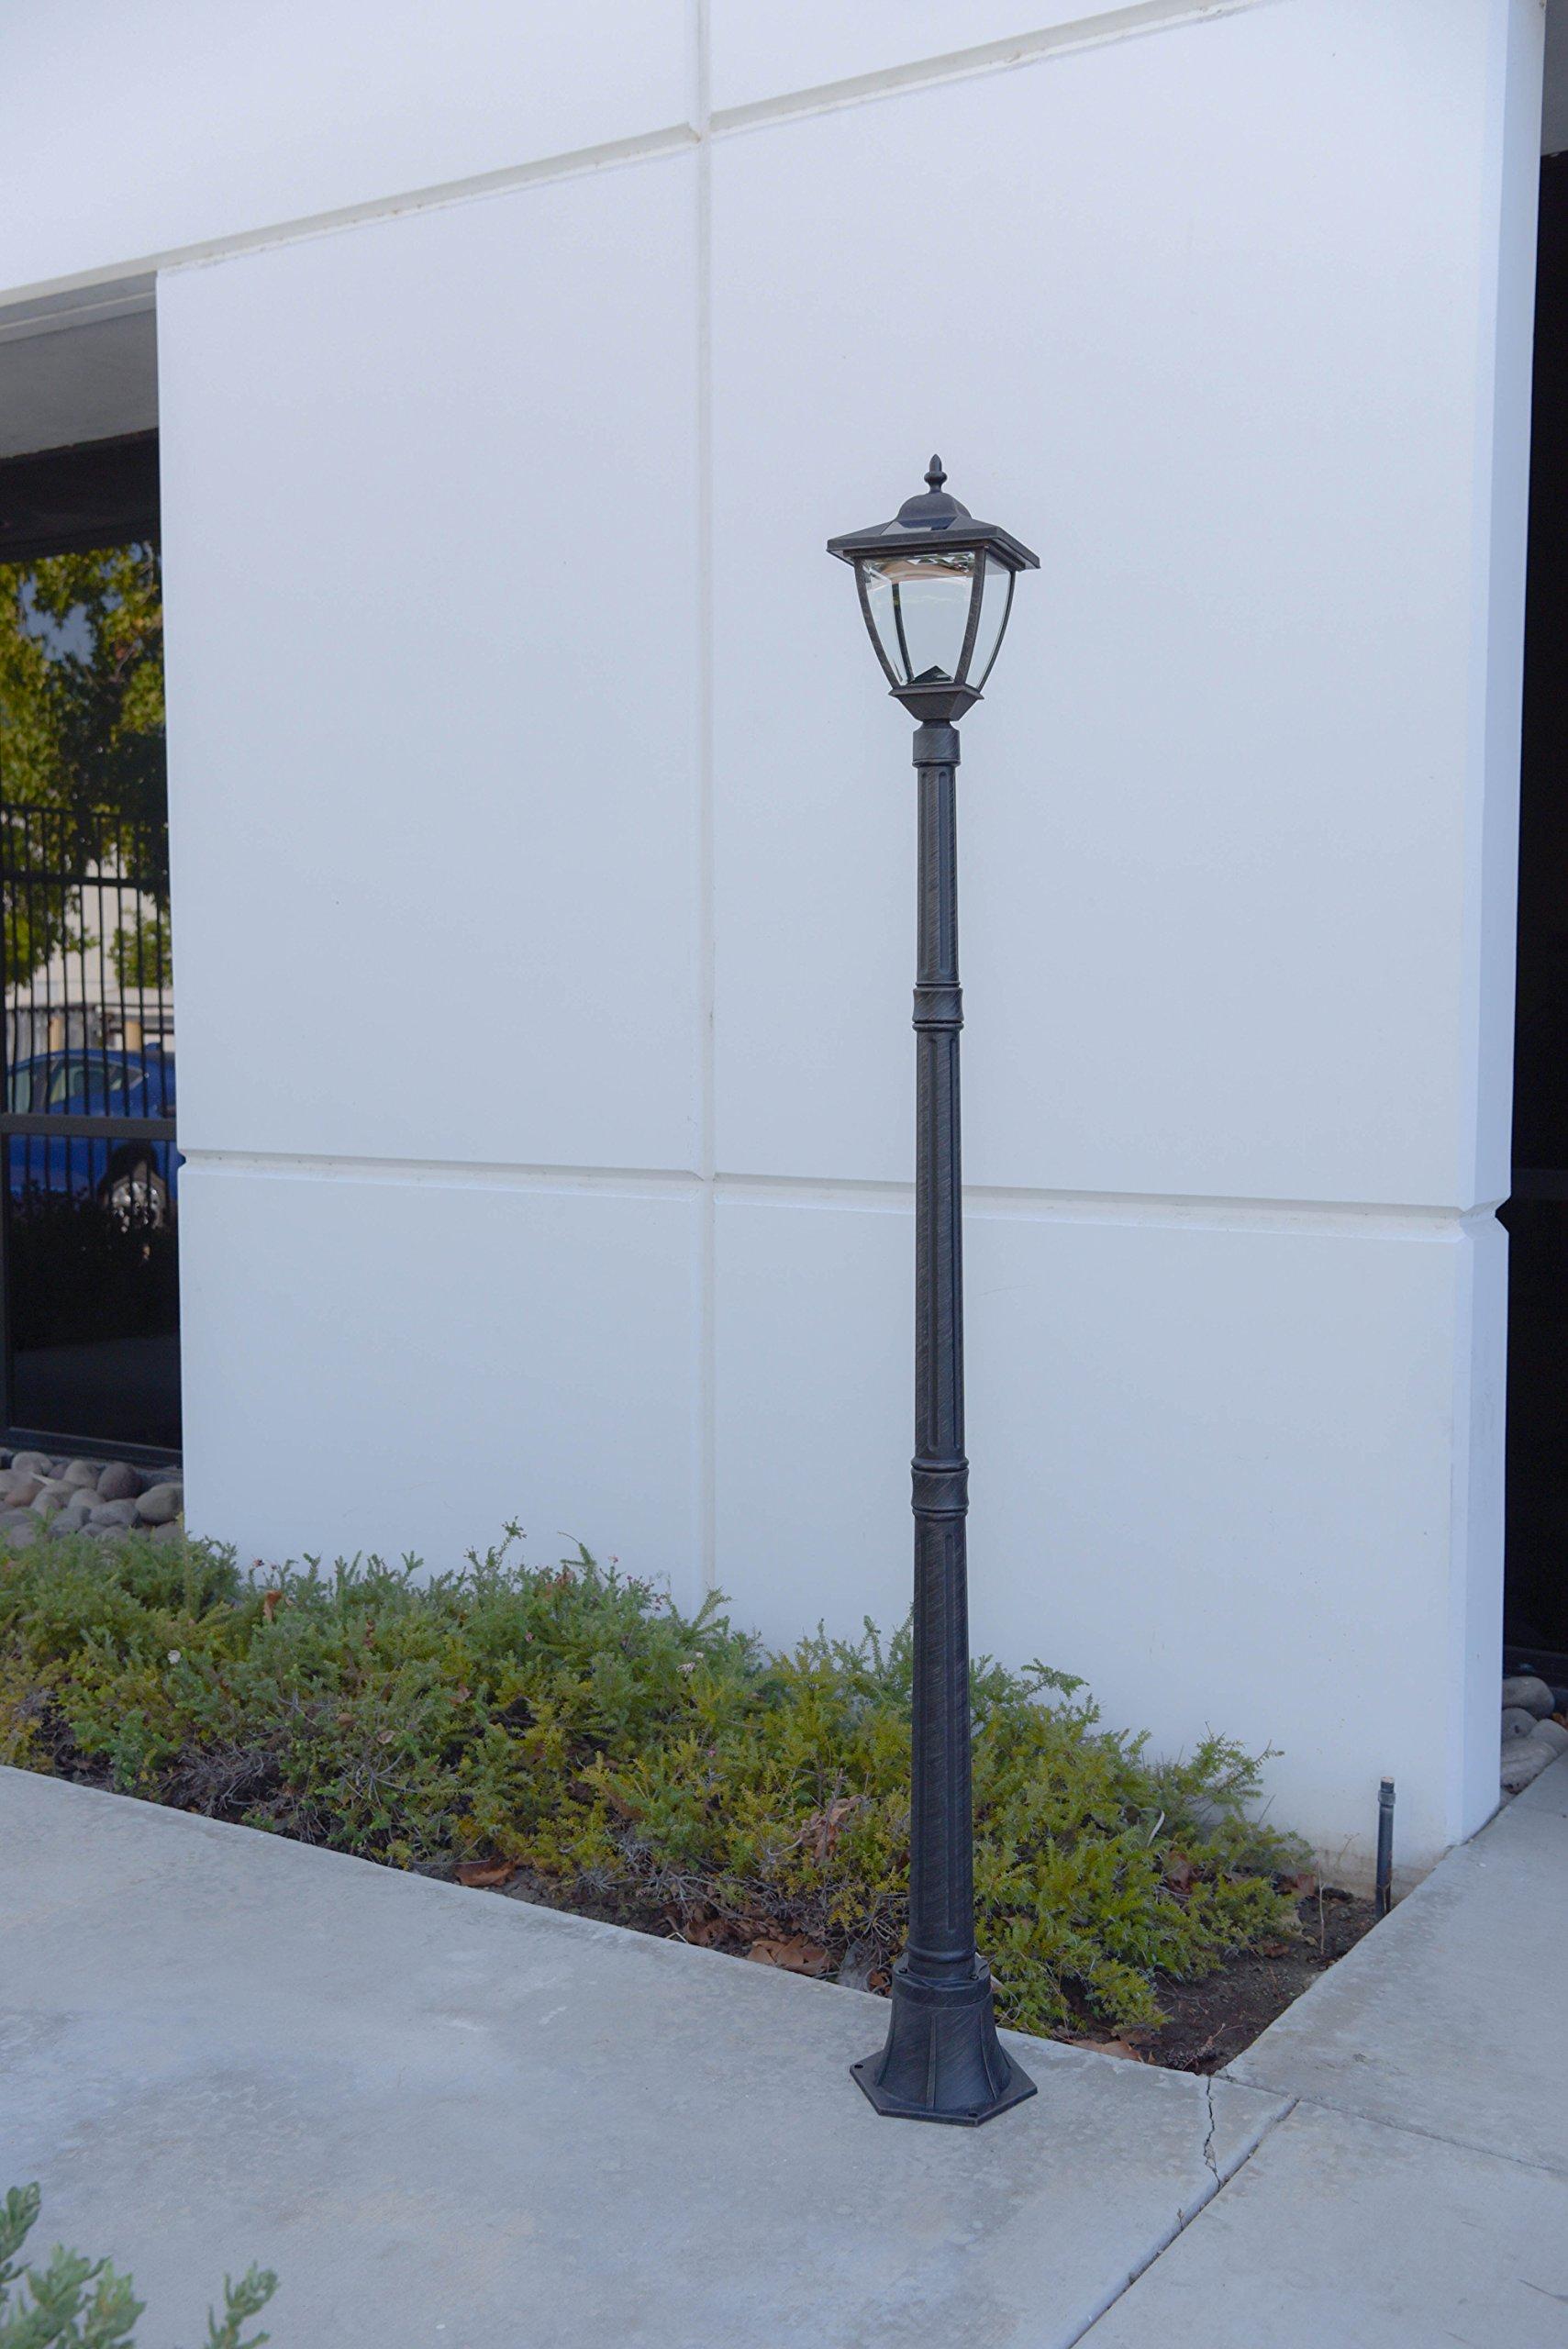 TruePower Cast Aluminum Solar Powered COB LED Streetlight Style Outdoor Light Lamp Post, Brushed Iron Rust Finish